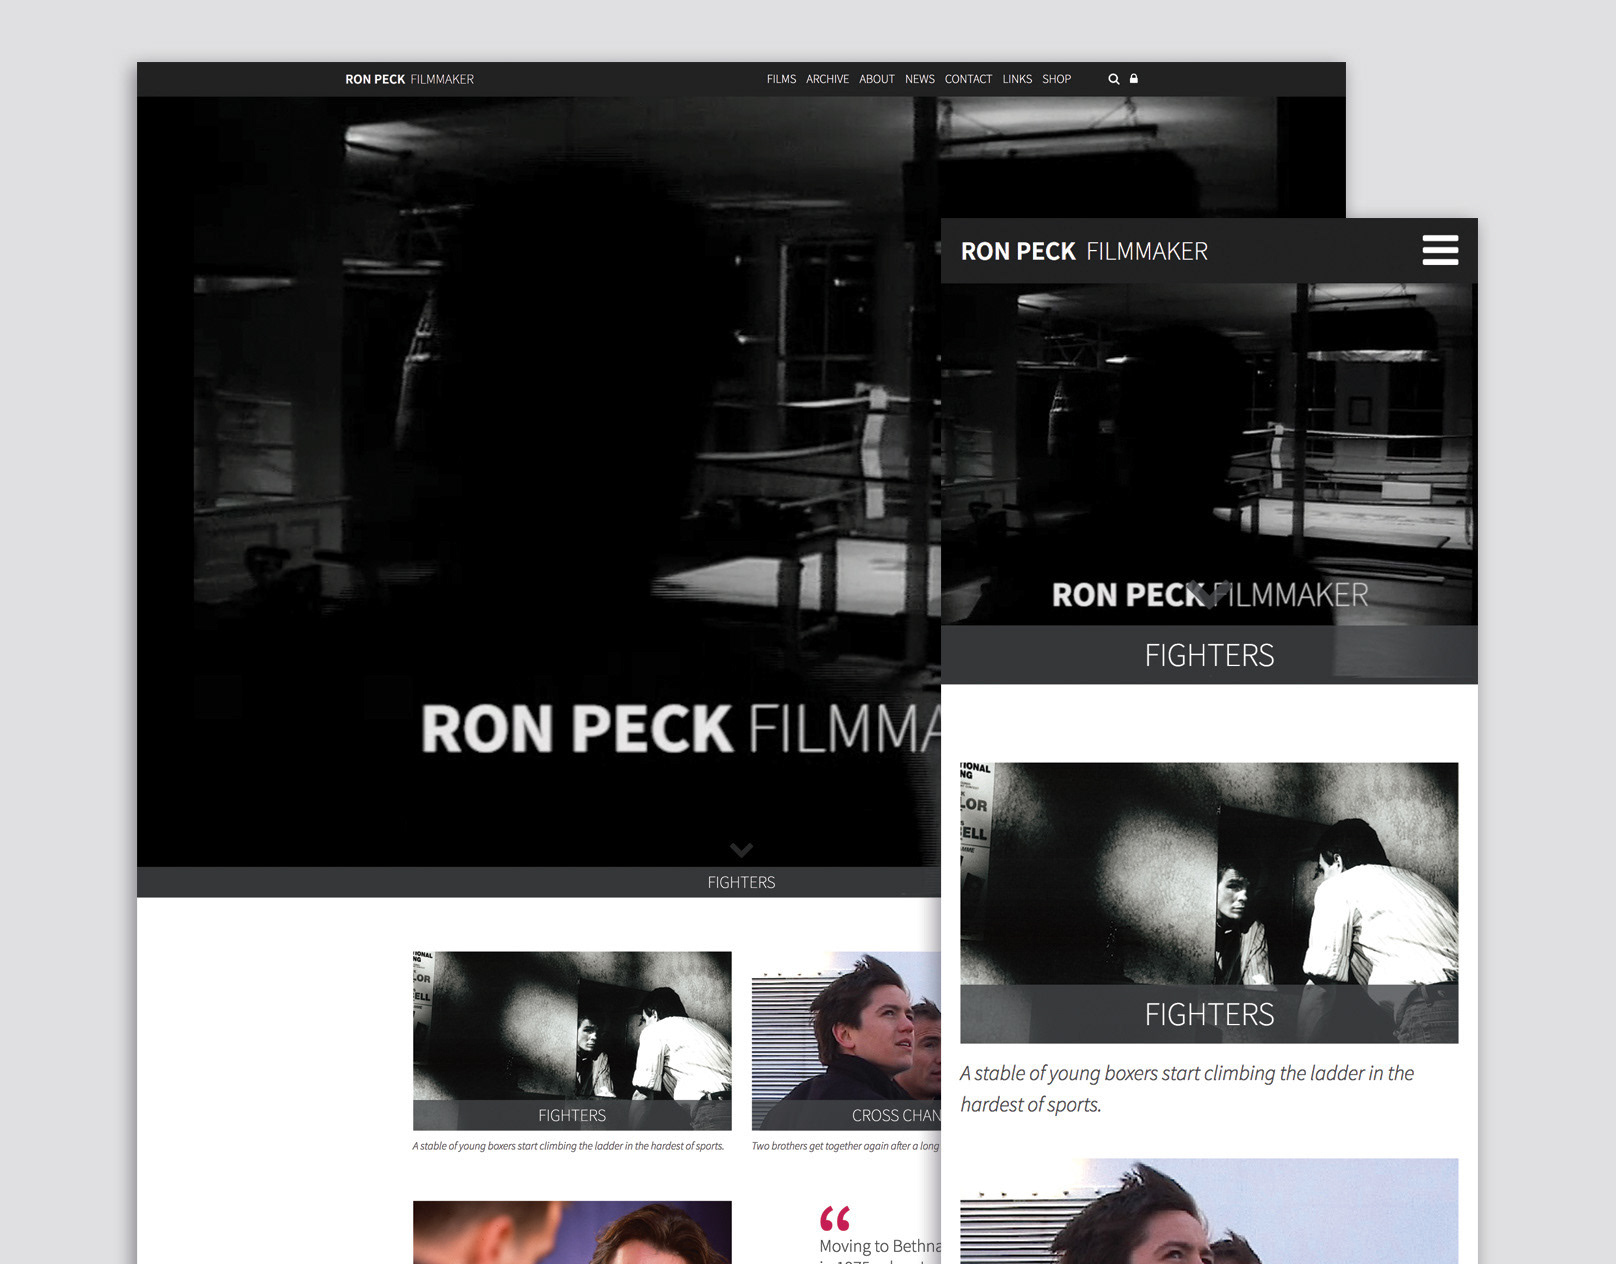 Ron Peck